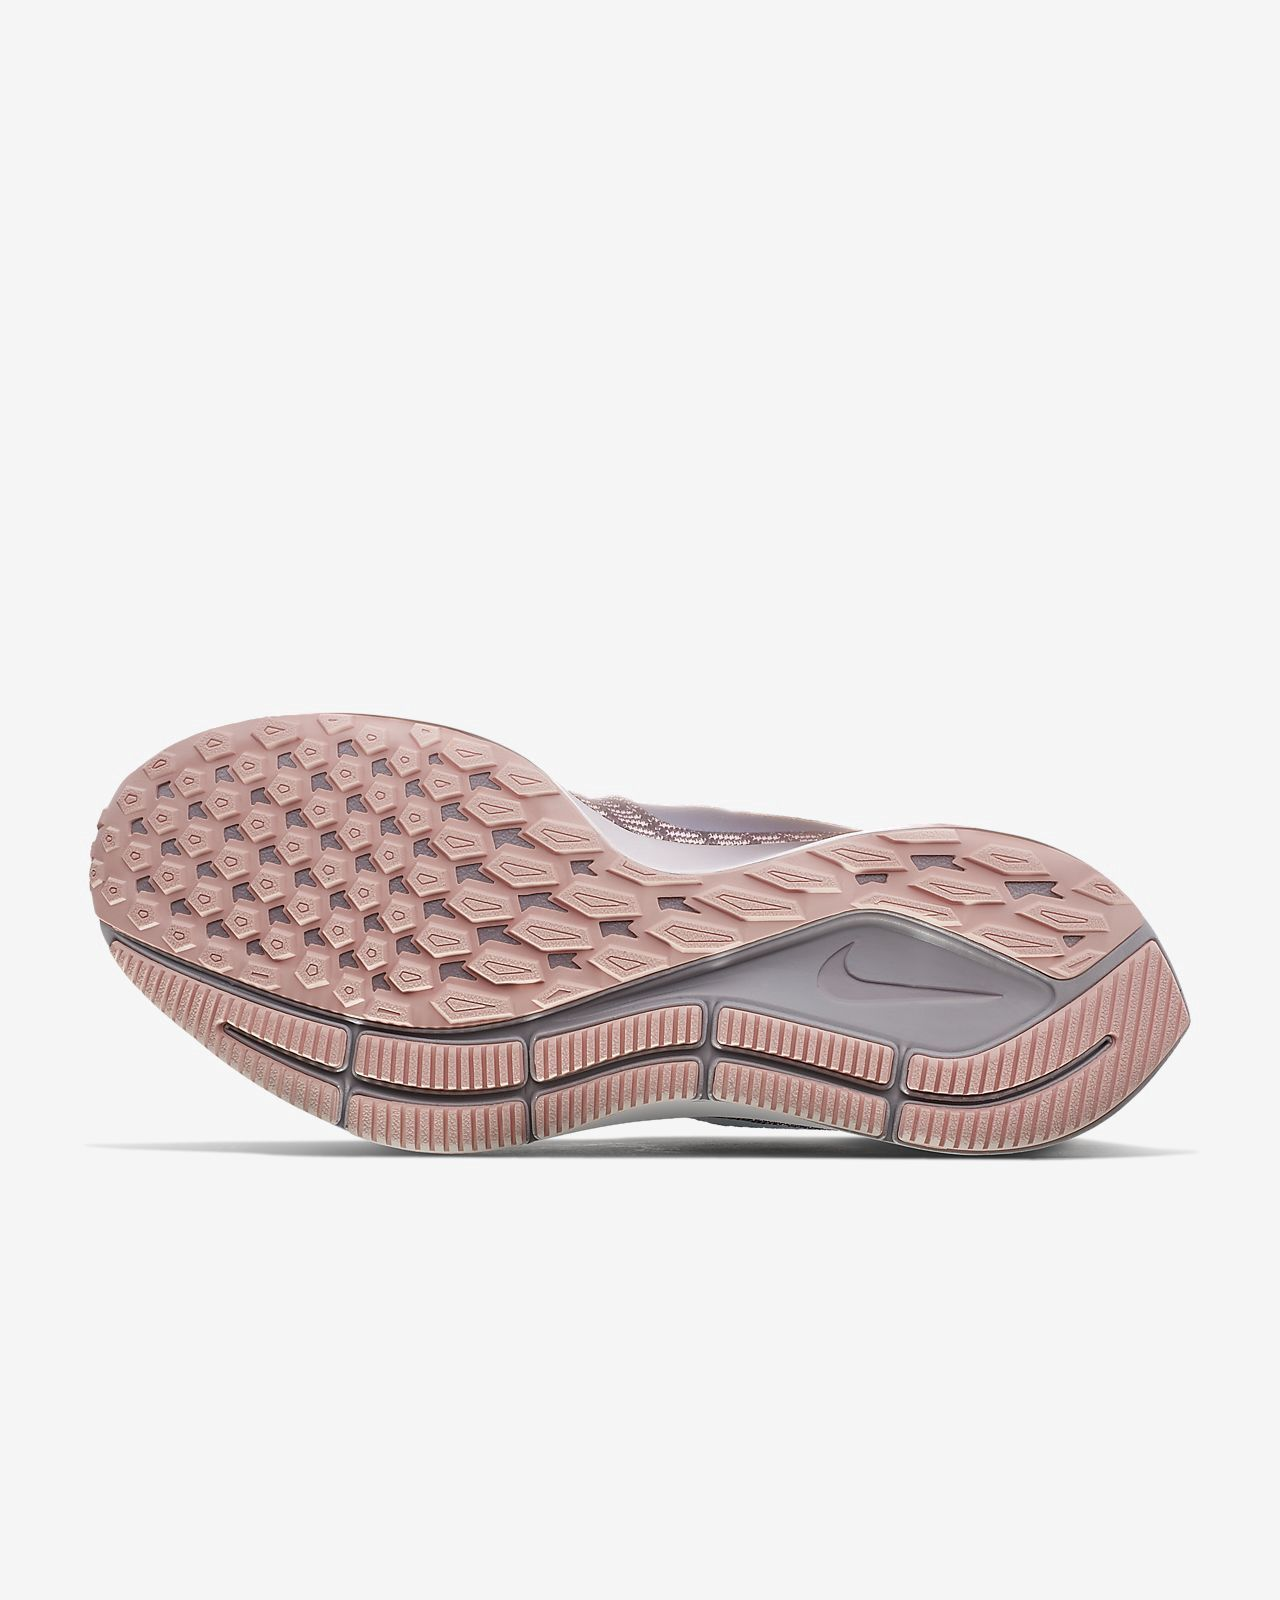 cfc9c8d2b665 Nike Air Zoom Pegasus 35 Women s Running Shoe - 11.5